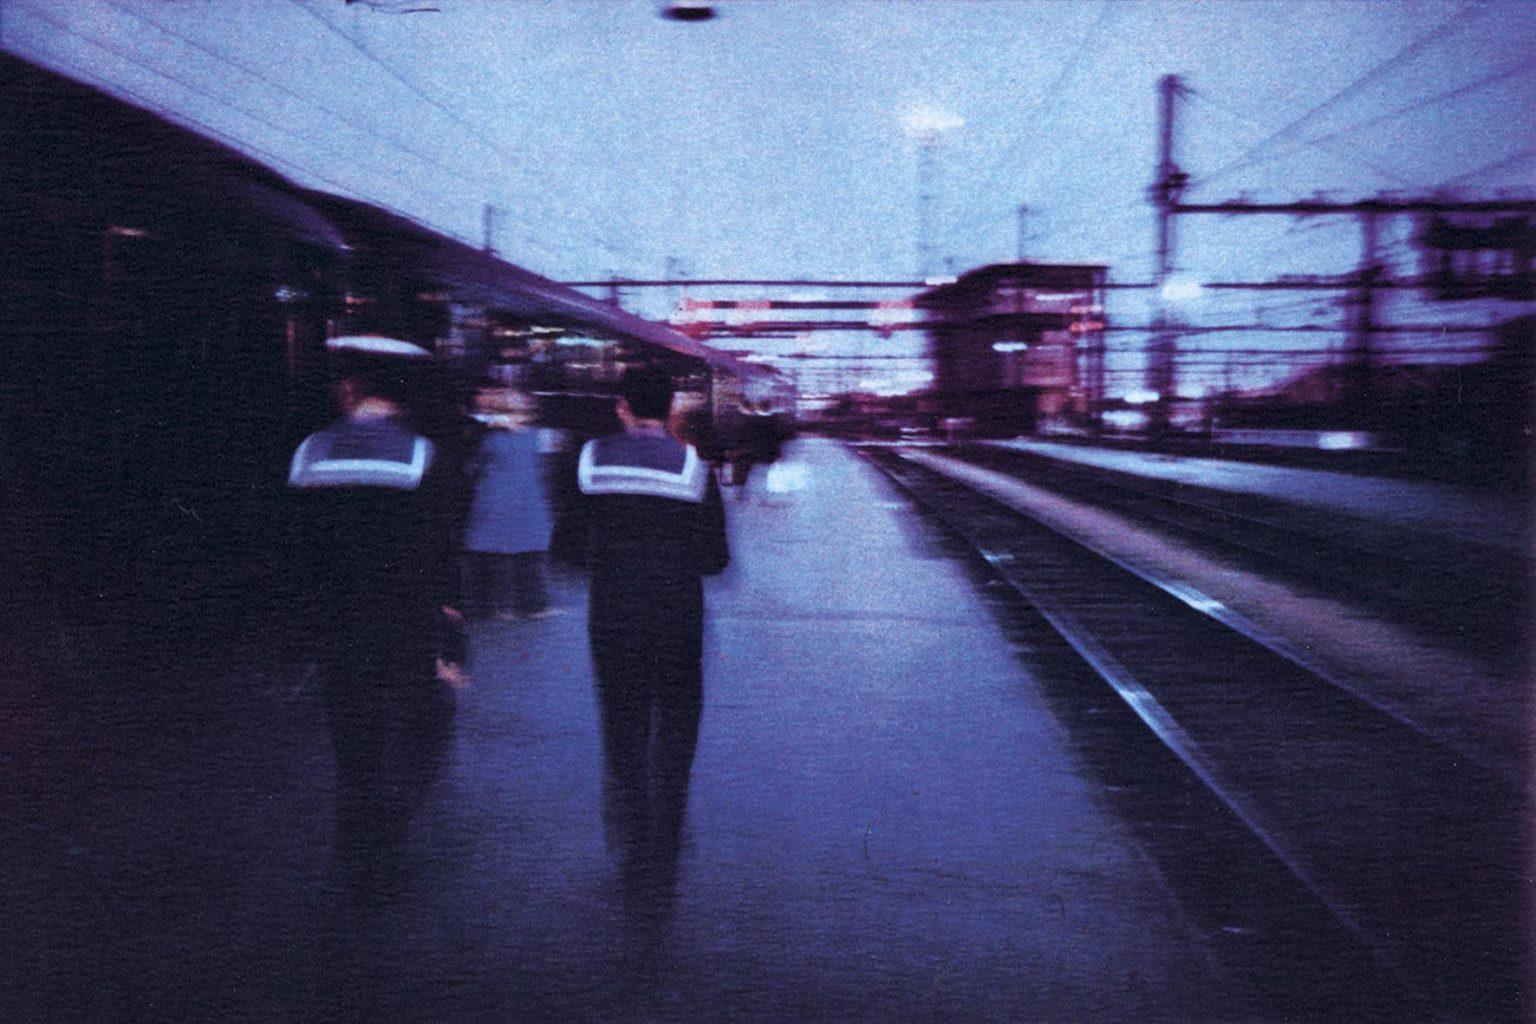 Bernard Plossu Gare de Lyon Paris Photo Days Initial Labo